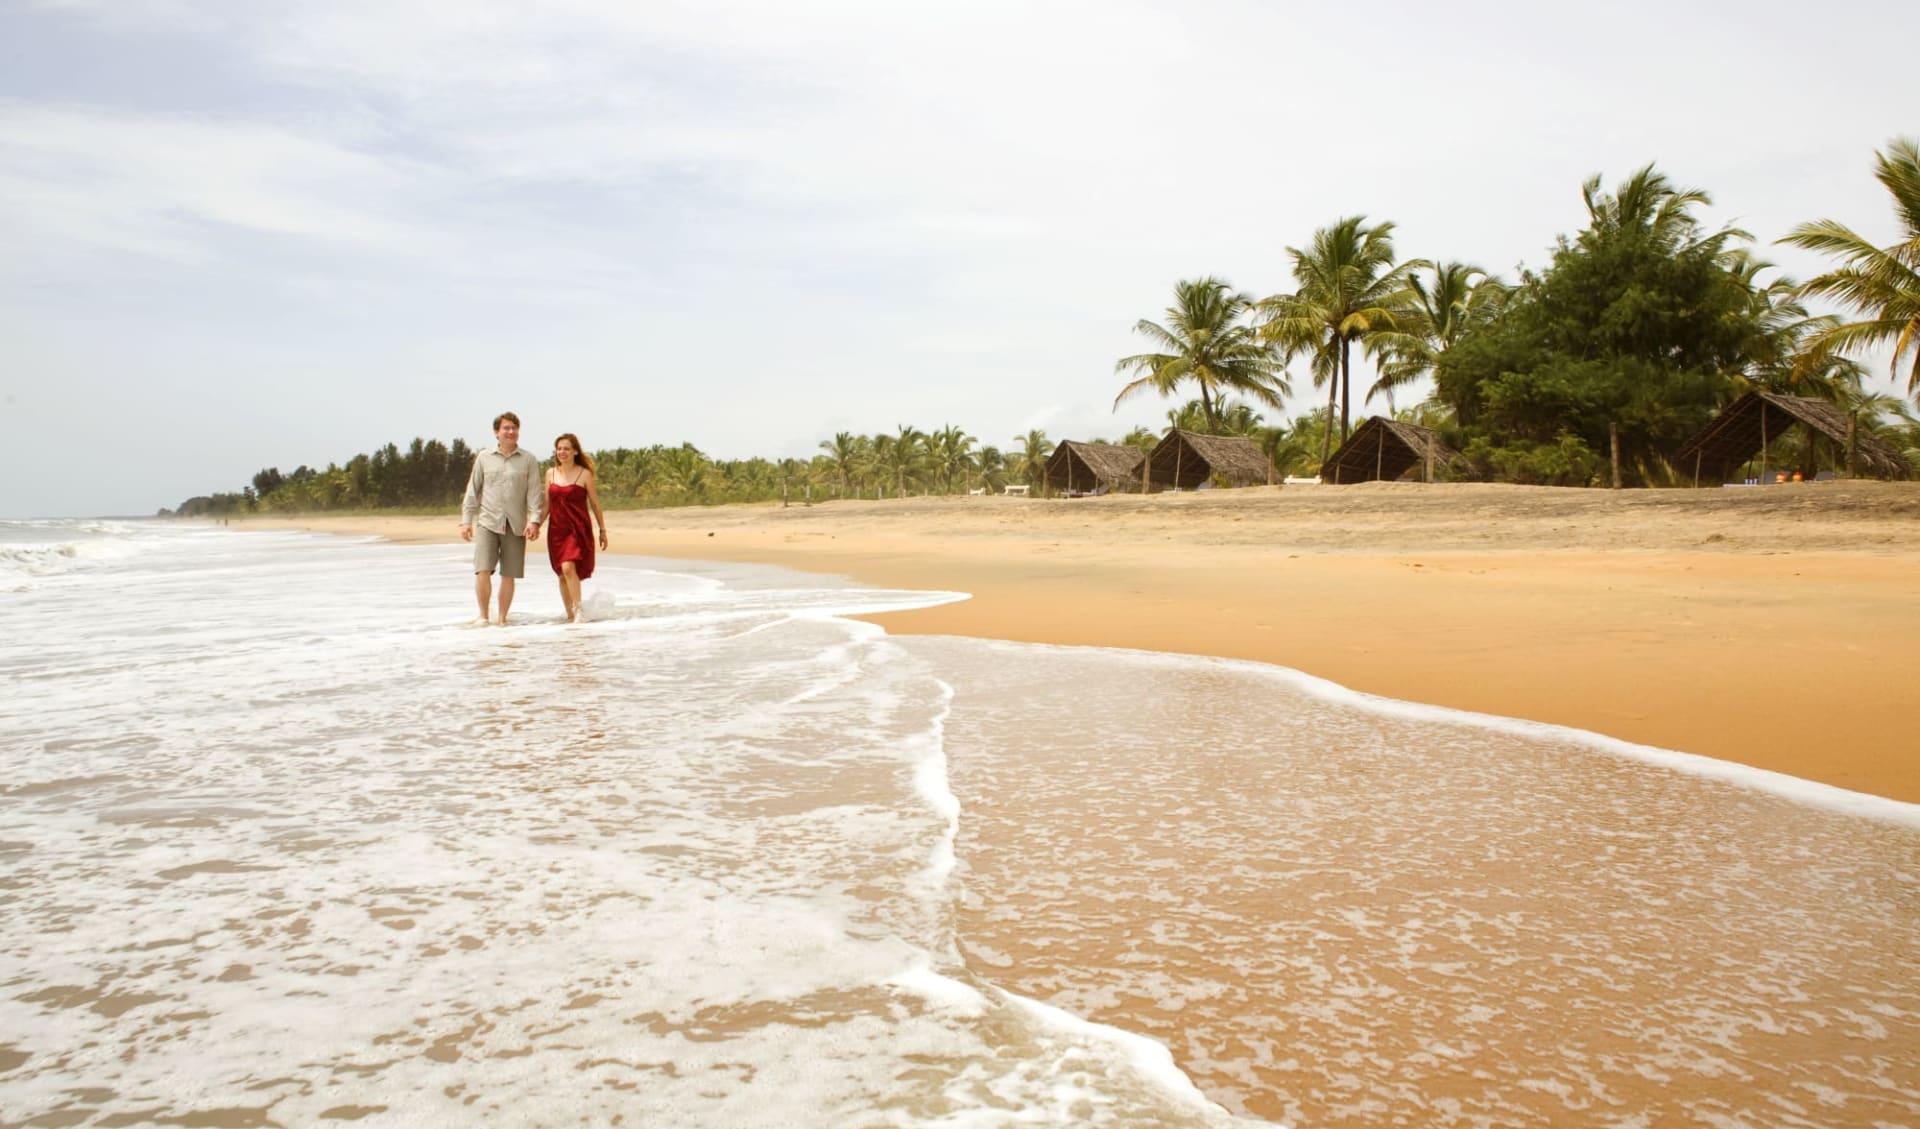 Nattika Beach Ayurveda Resort in Kochi: Nattika Beach